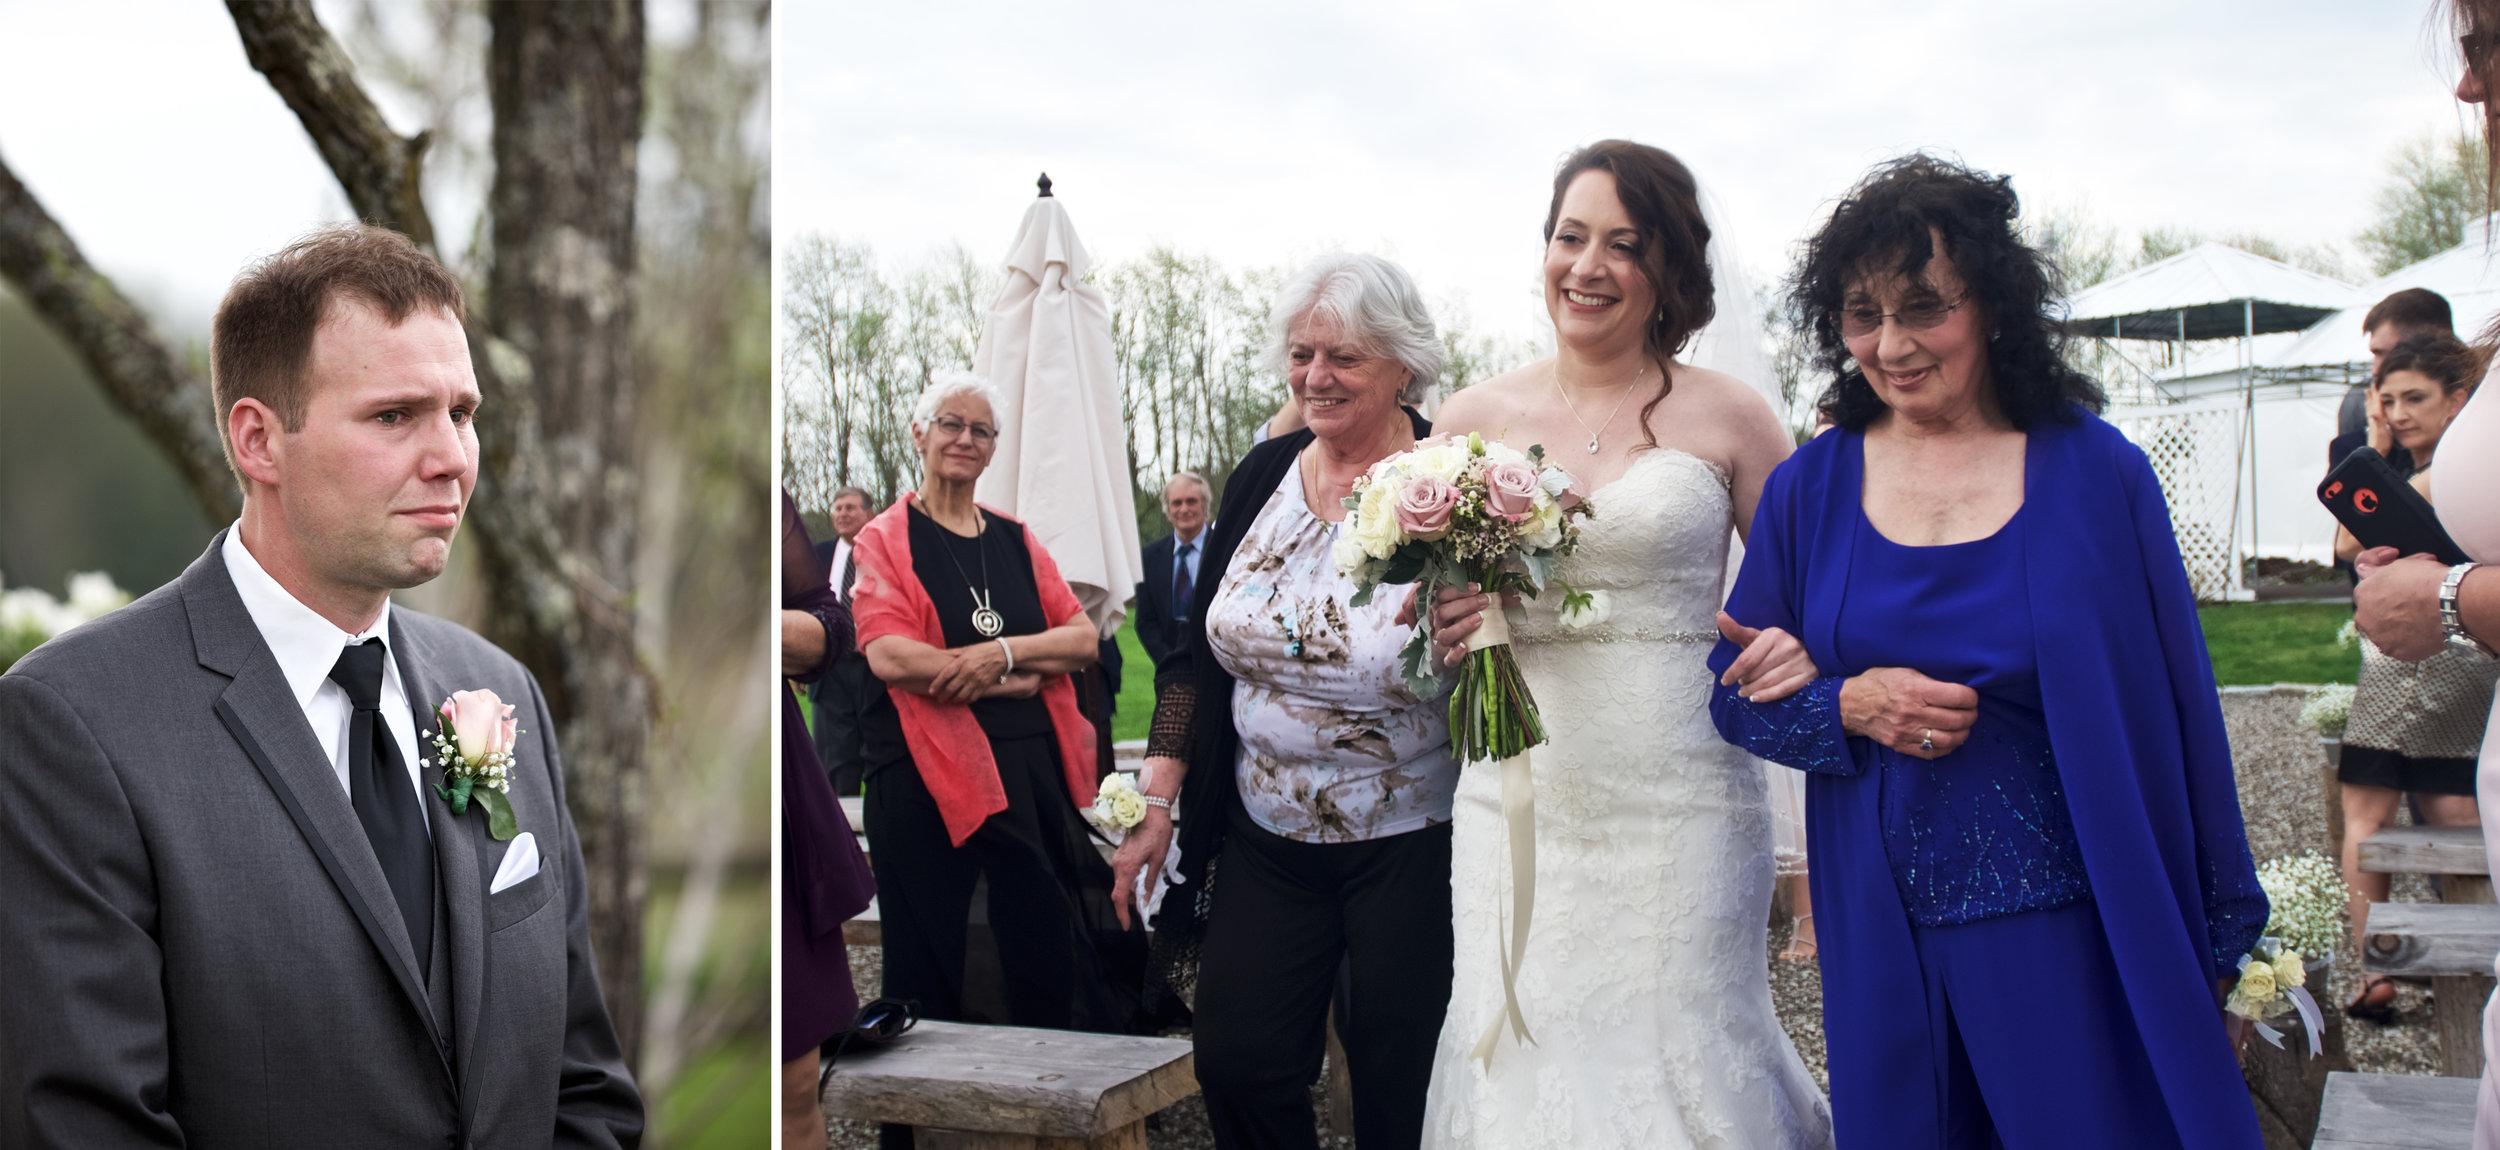 Lippincott manor wedding, wallkill ny wedding, photography, photos o.jpg